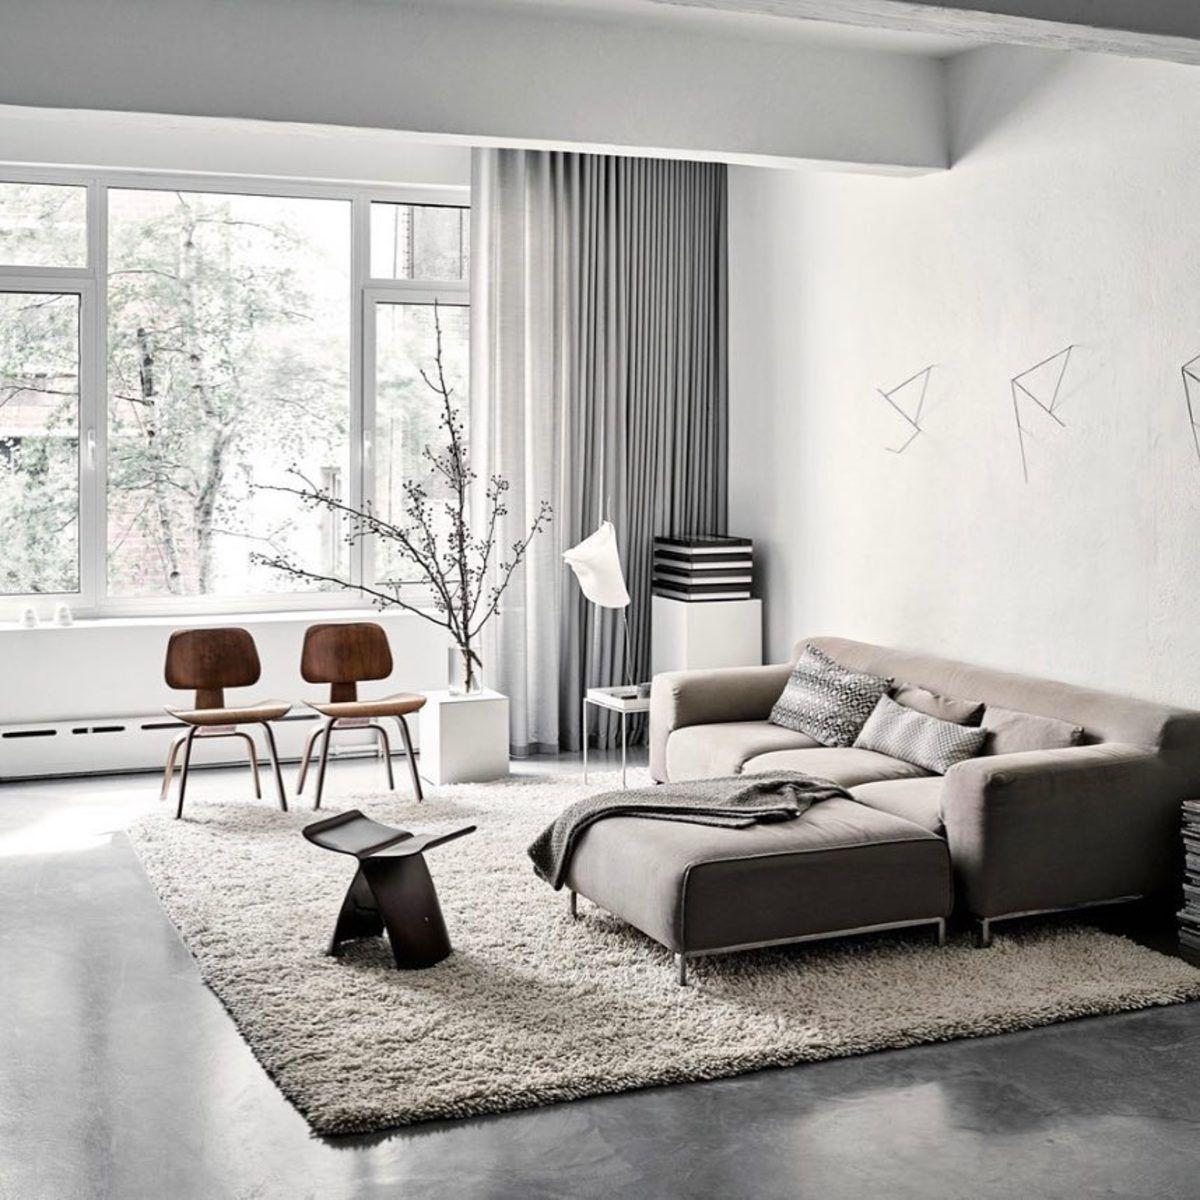 Minimal Interior Design Inspiration   212   Interior design living room modern, Minimalism ...